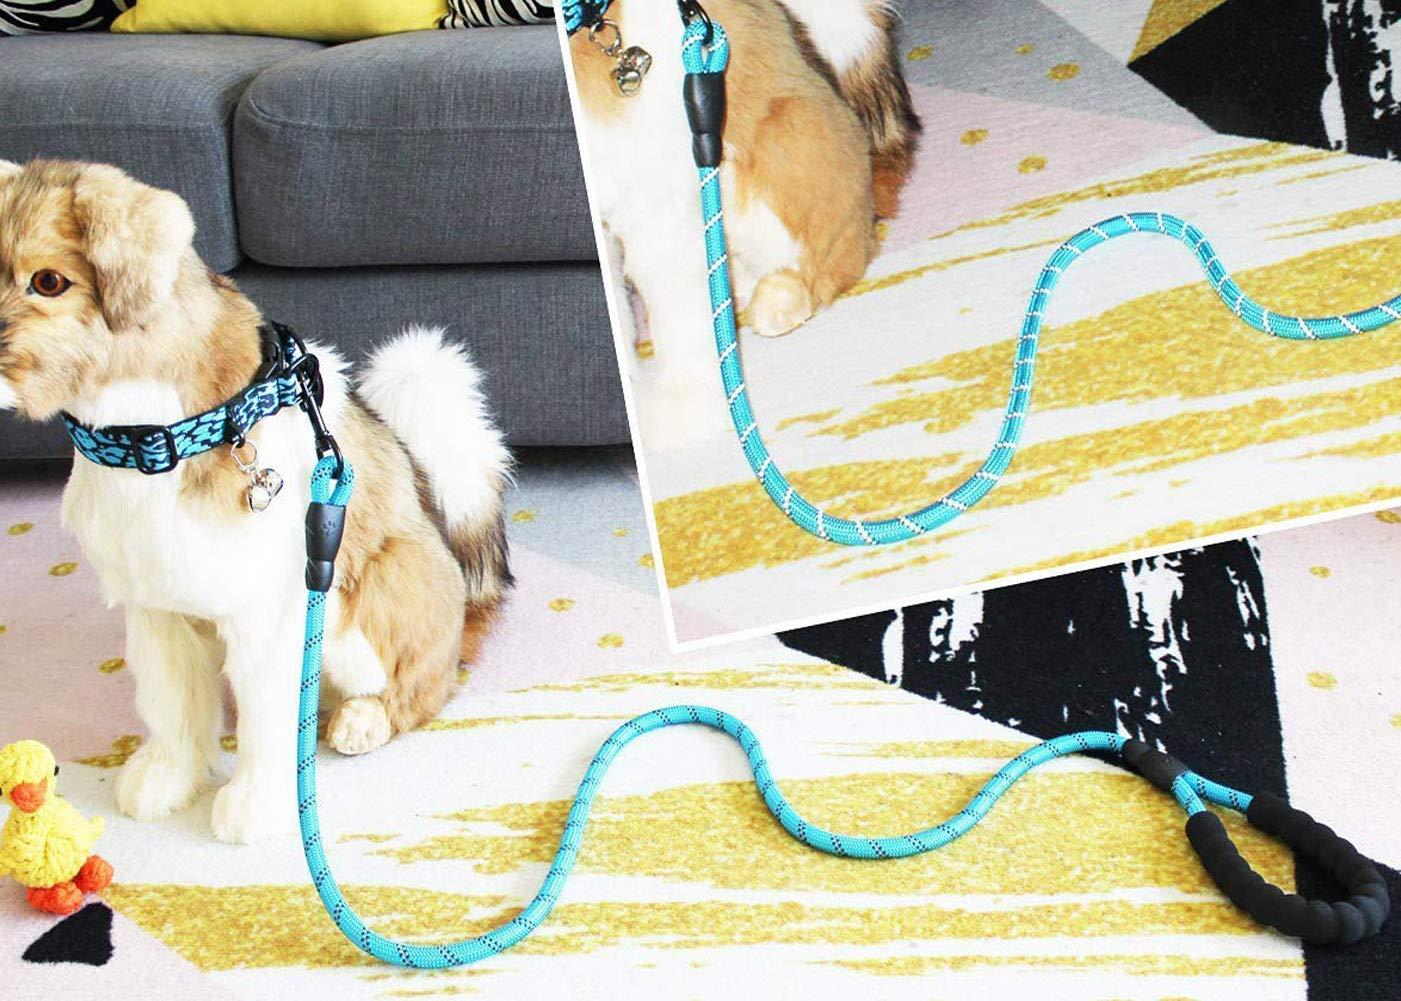 Negro 5 FT Correas Para Perros Resistentes Mango Acolchado C/ómodo E Hilos Altamente Reflectantes Correas Para Perros Para Perros Medianos Y Grandes Adiestramiento De Perros Correas Para Caminar